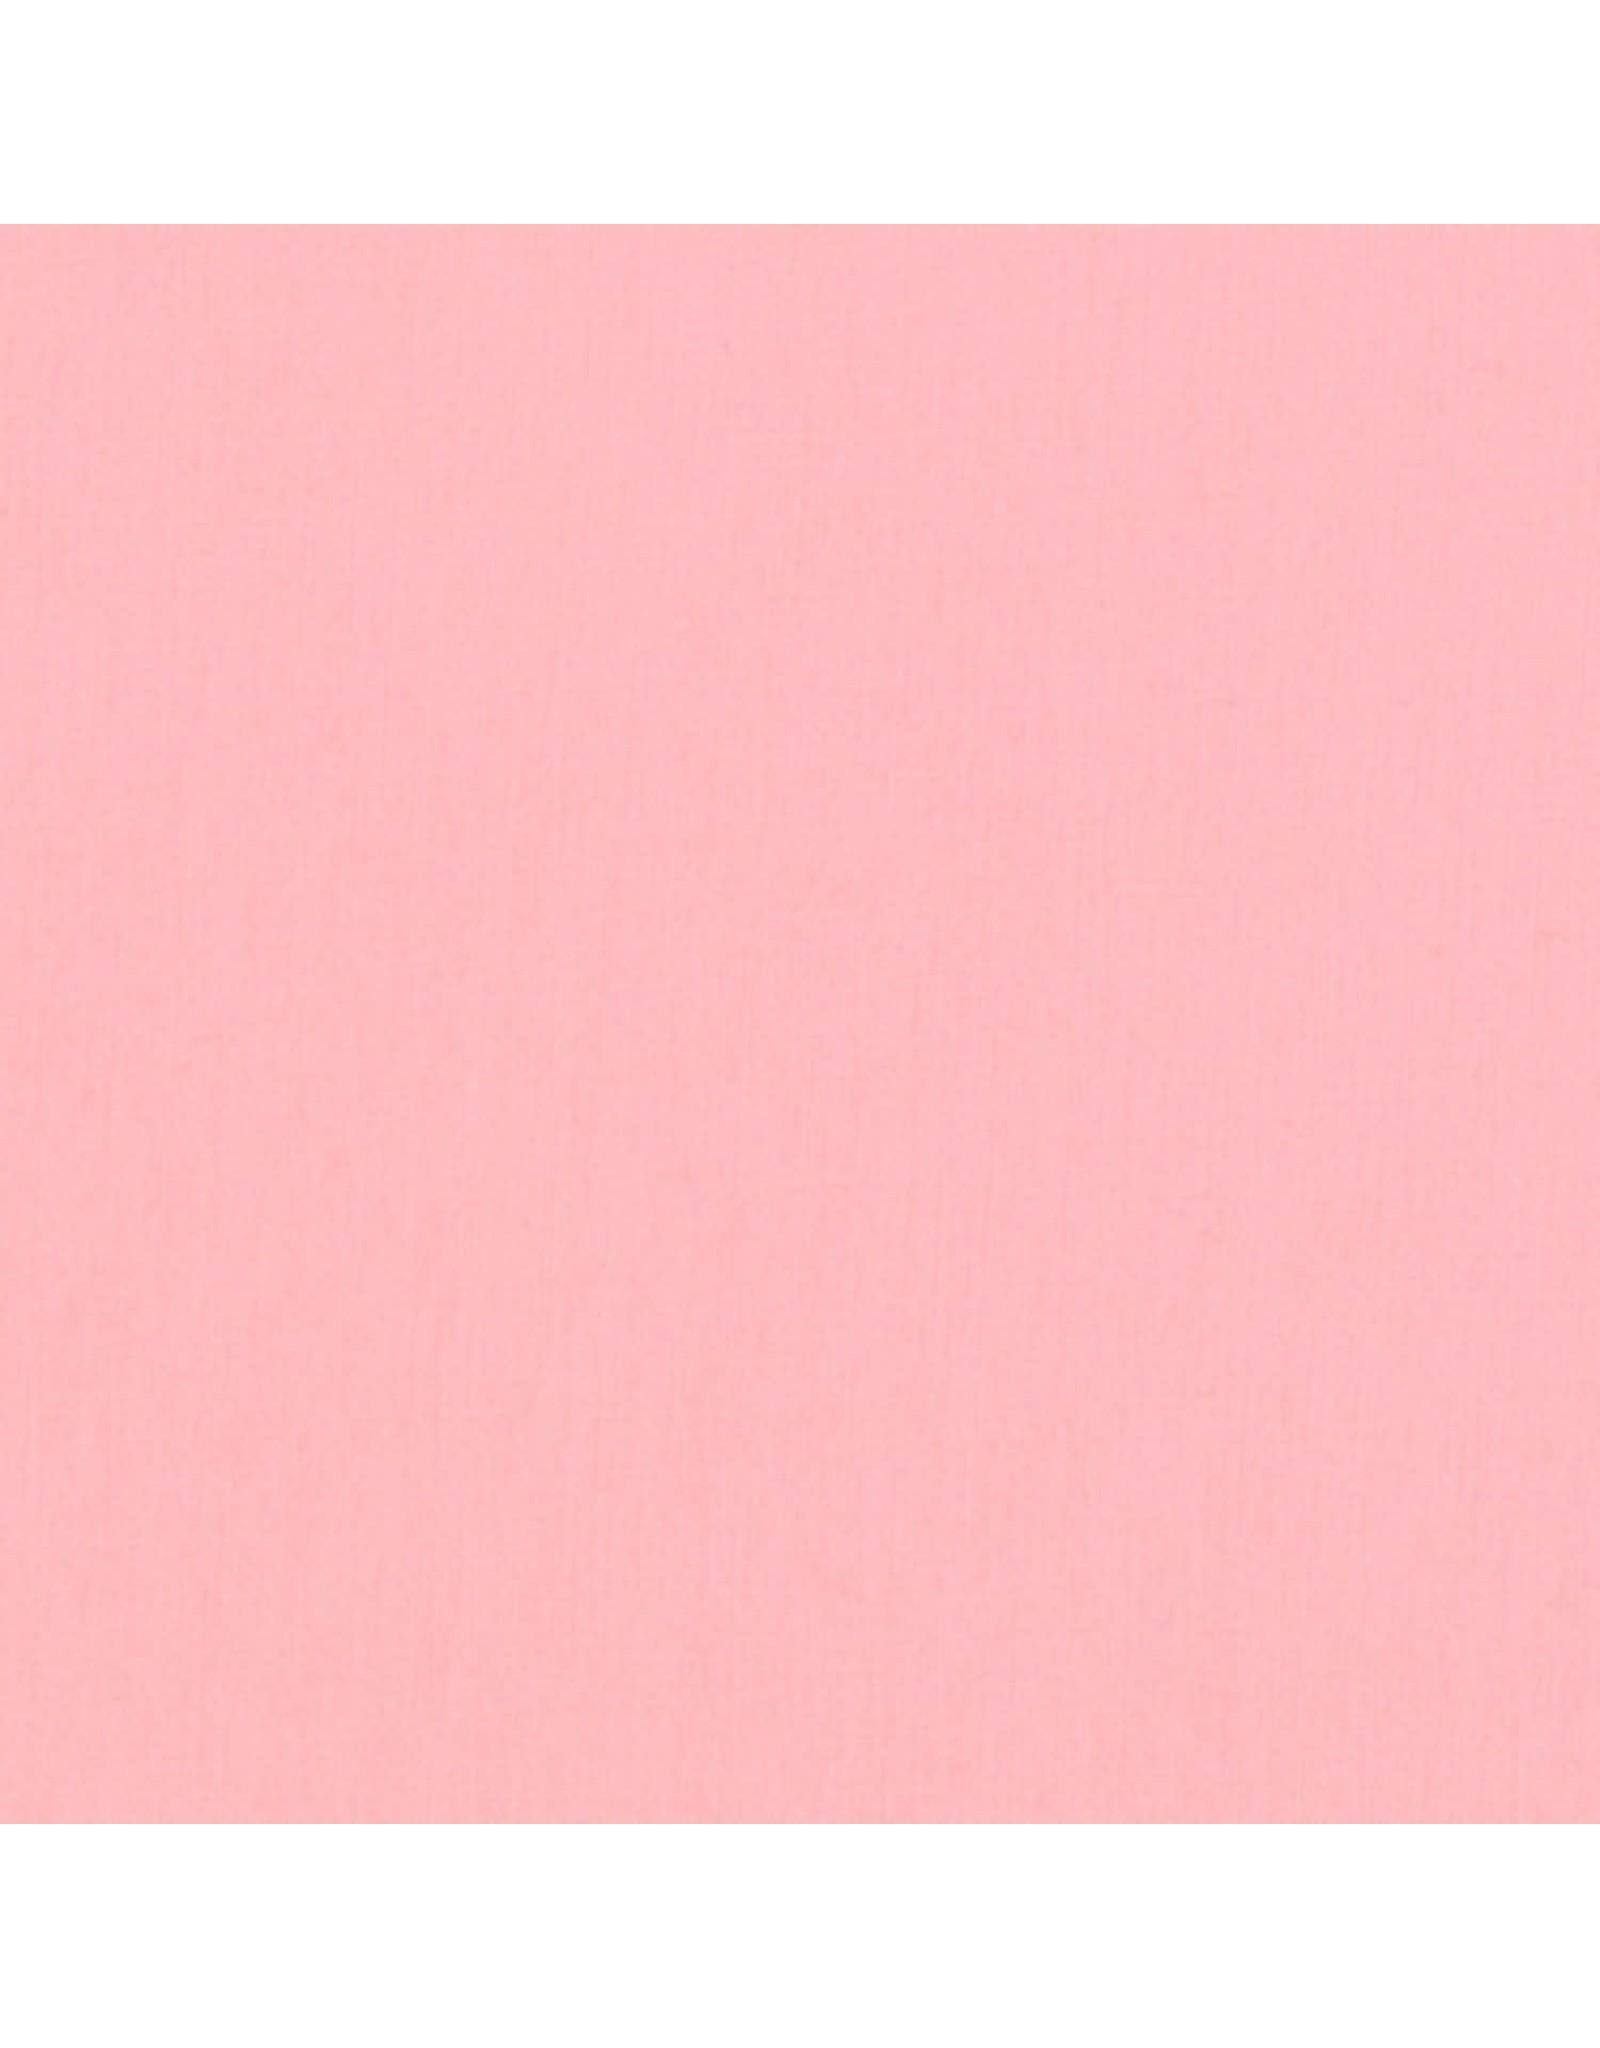 Robert Kaufman Kona Solids - 1465 - Dusty Peach